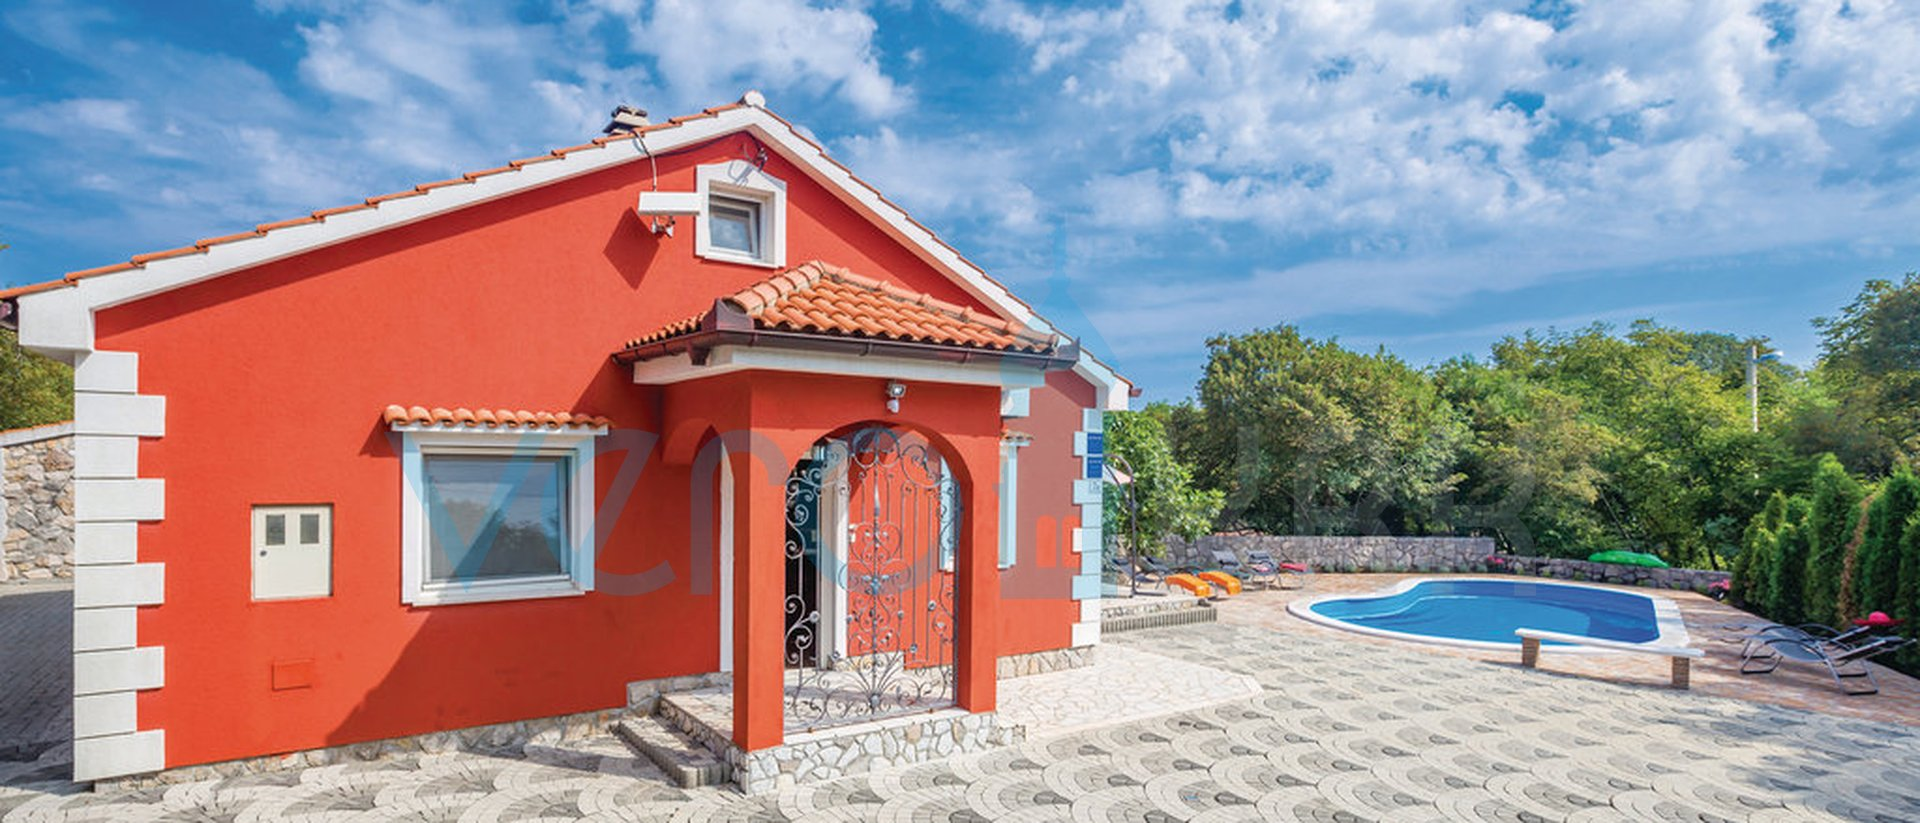 Casa, 110 m2, Vendita, Dobrinj